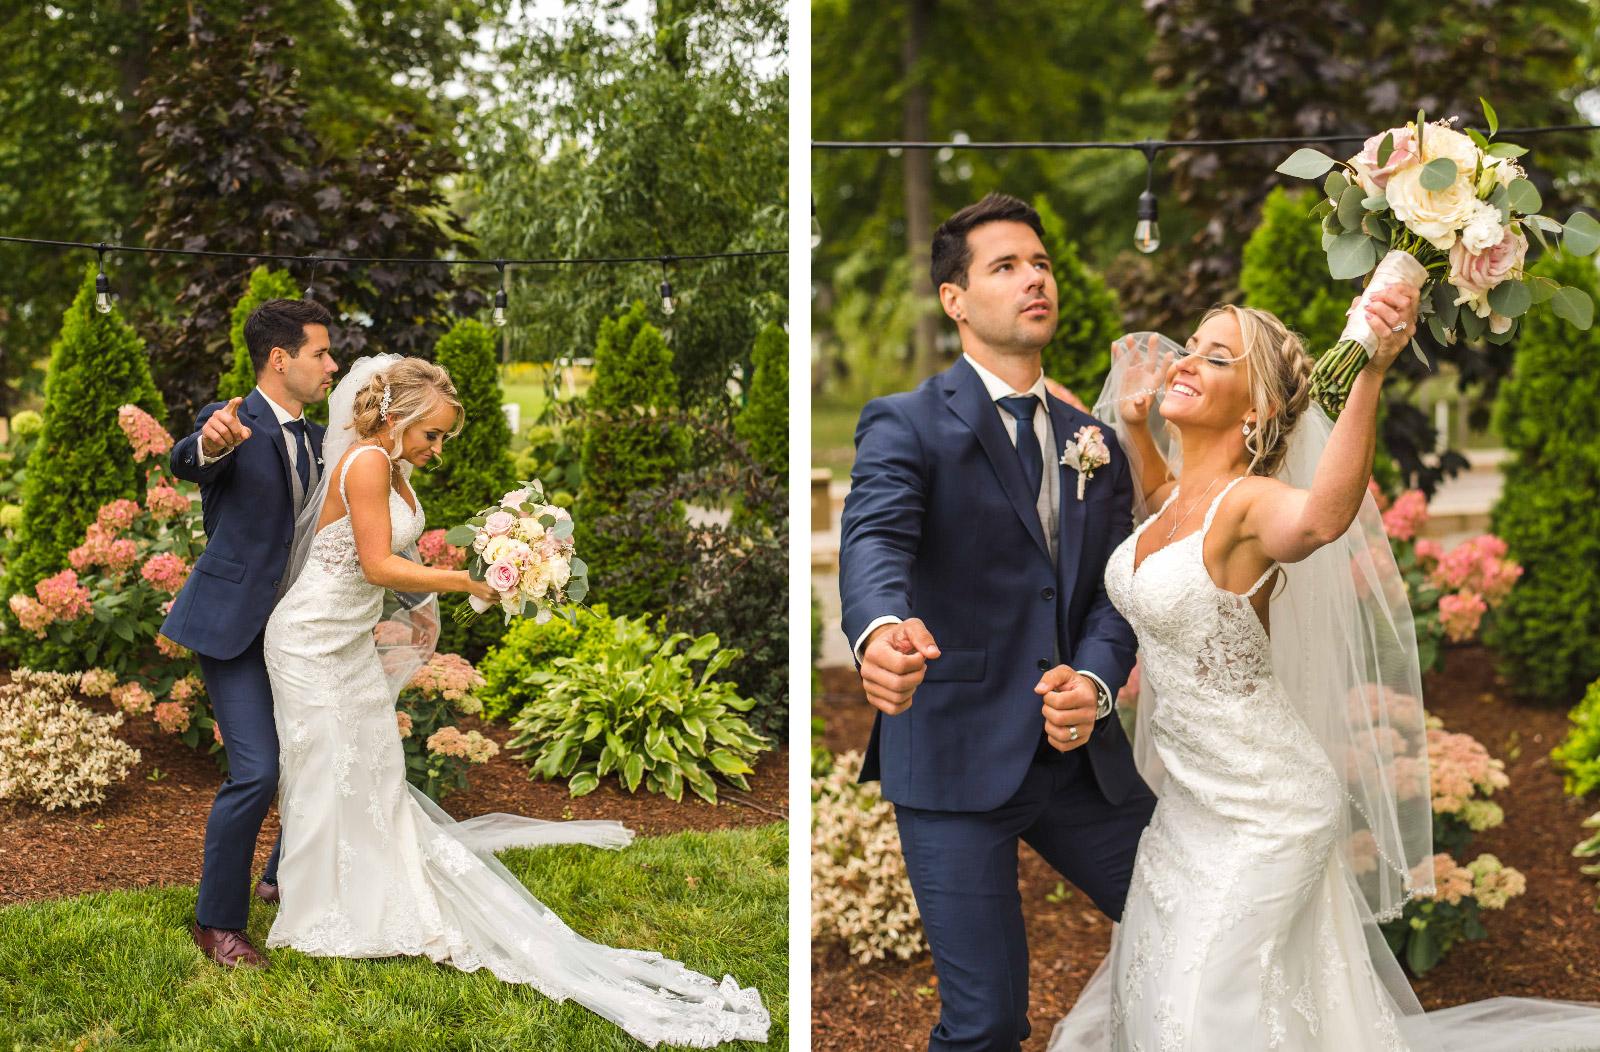 Eli & Michelle Dancing Hush Hush Photography & Film Aidan Hennebry Hamilton Wedding Photographer Videographer-01.jpg